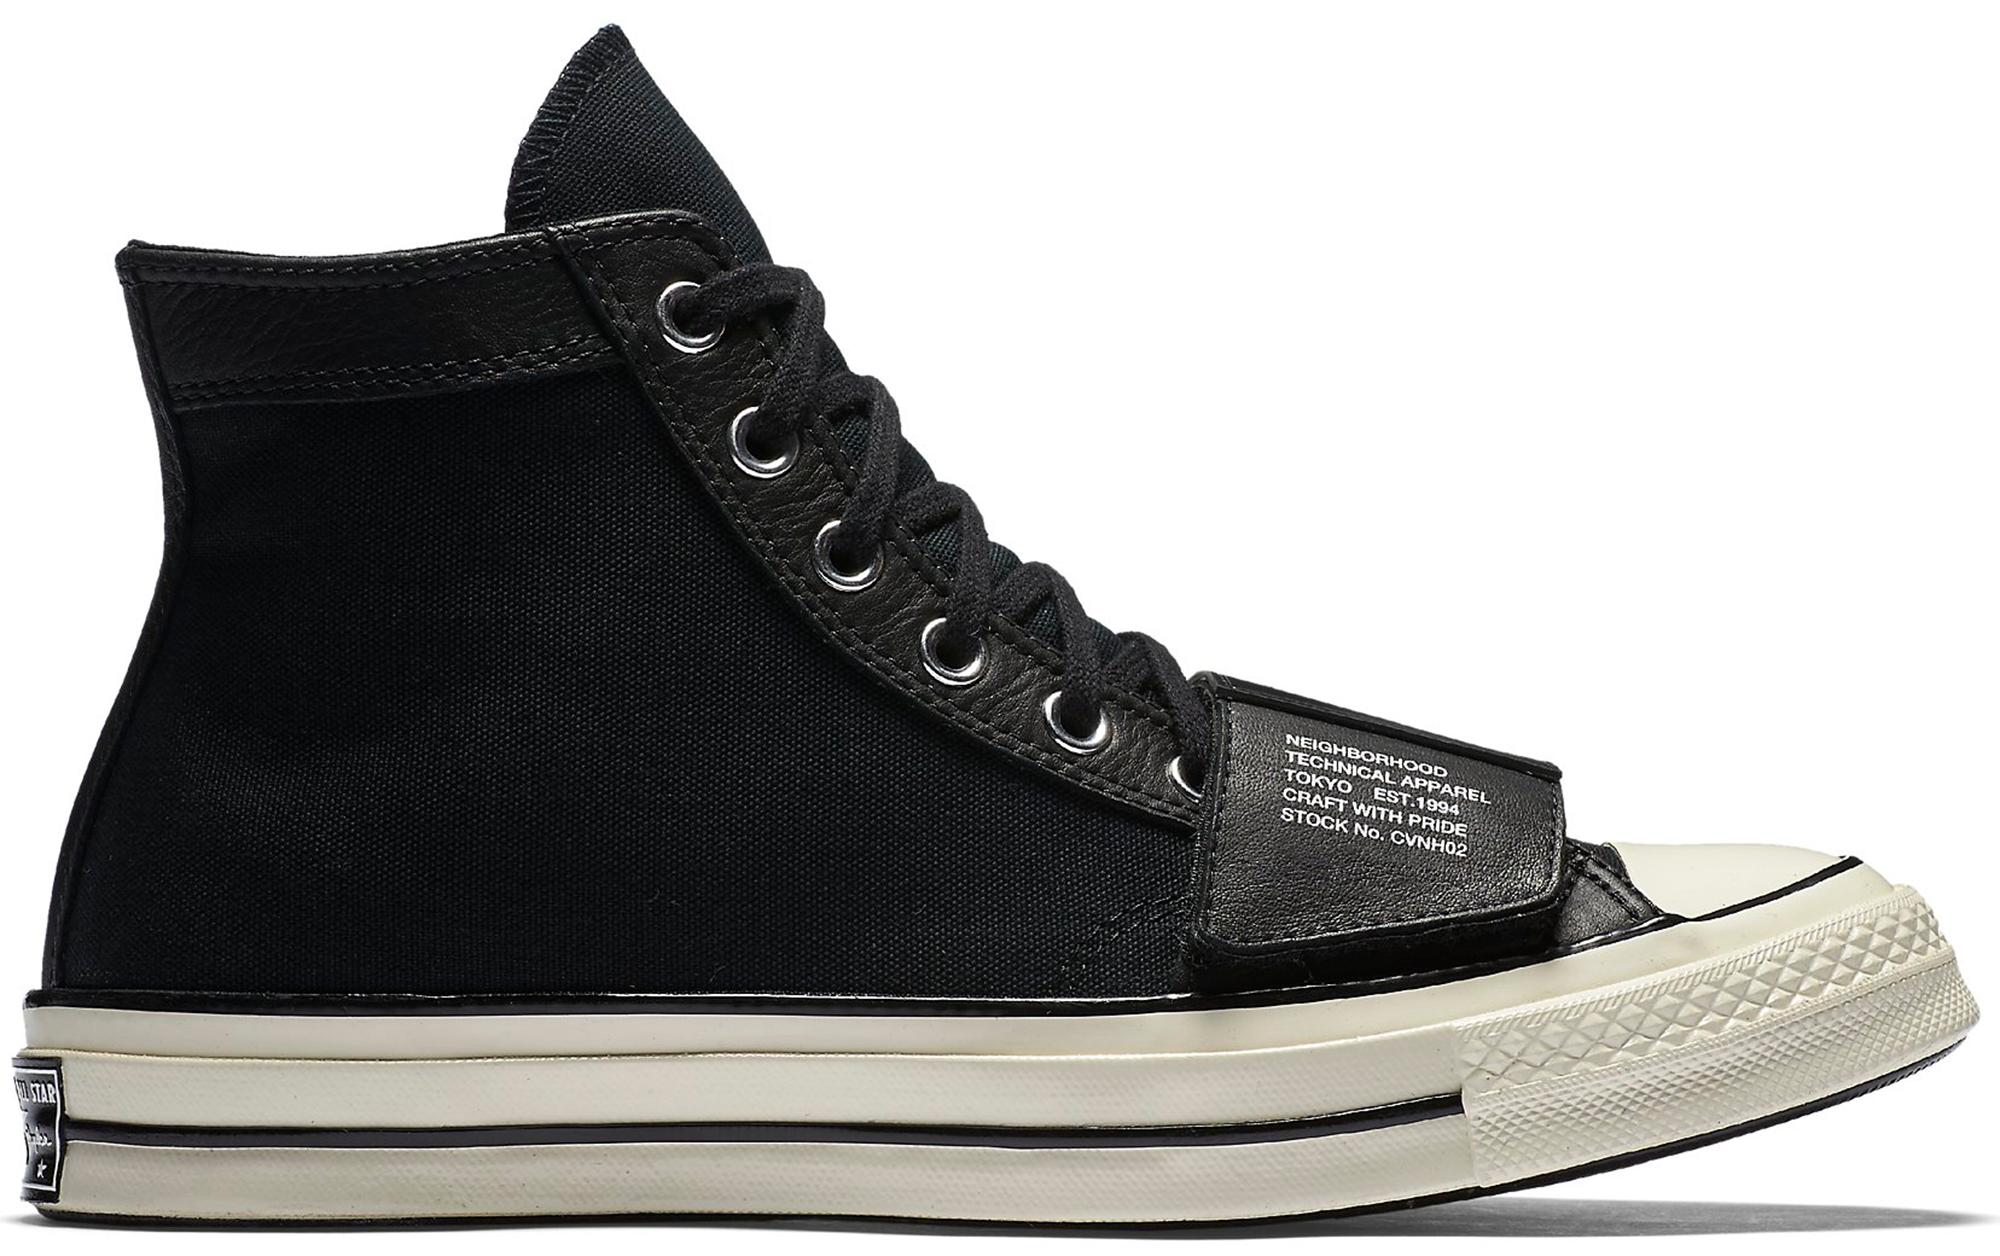 Converse / Chuck Taylor All Star 70's Sneakers Hi / Black